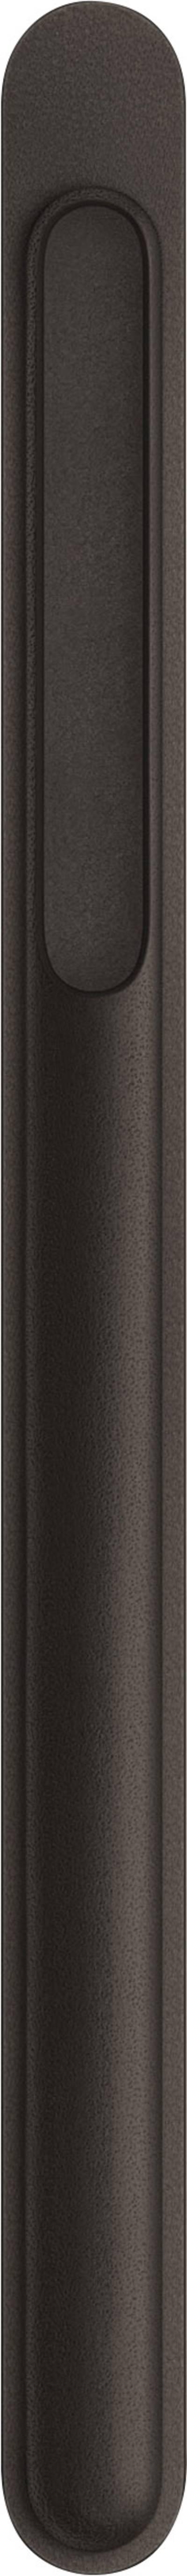 Image of iPad Pro Pencil Case Apple Black